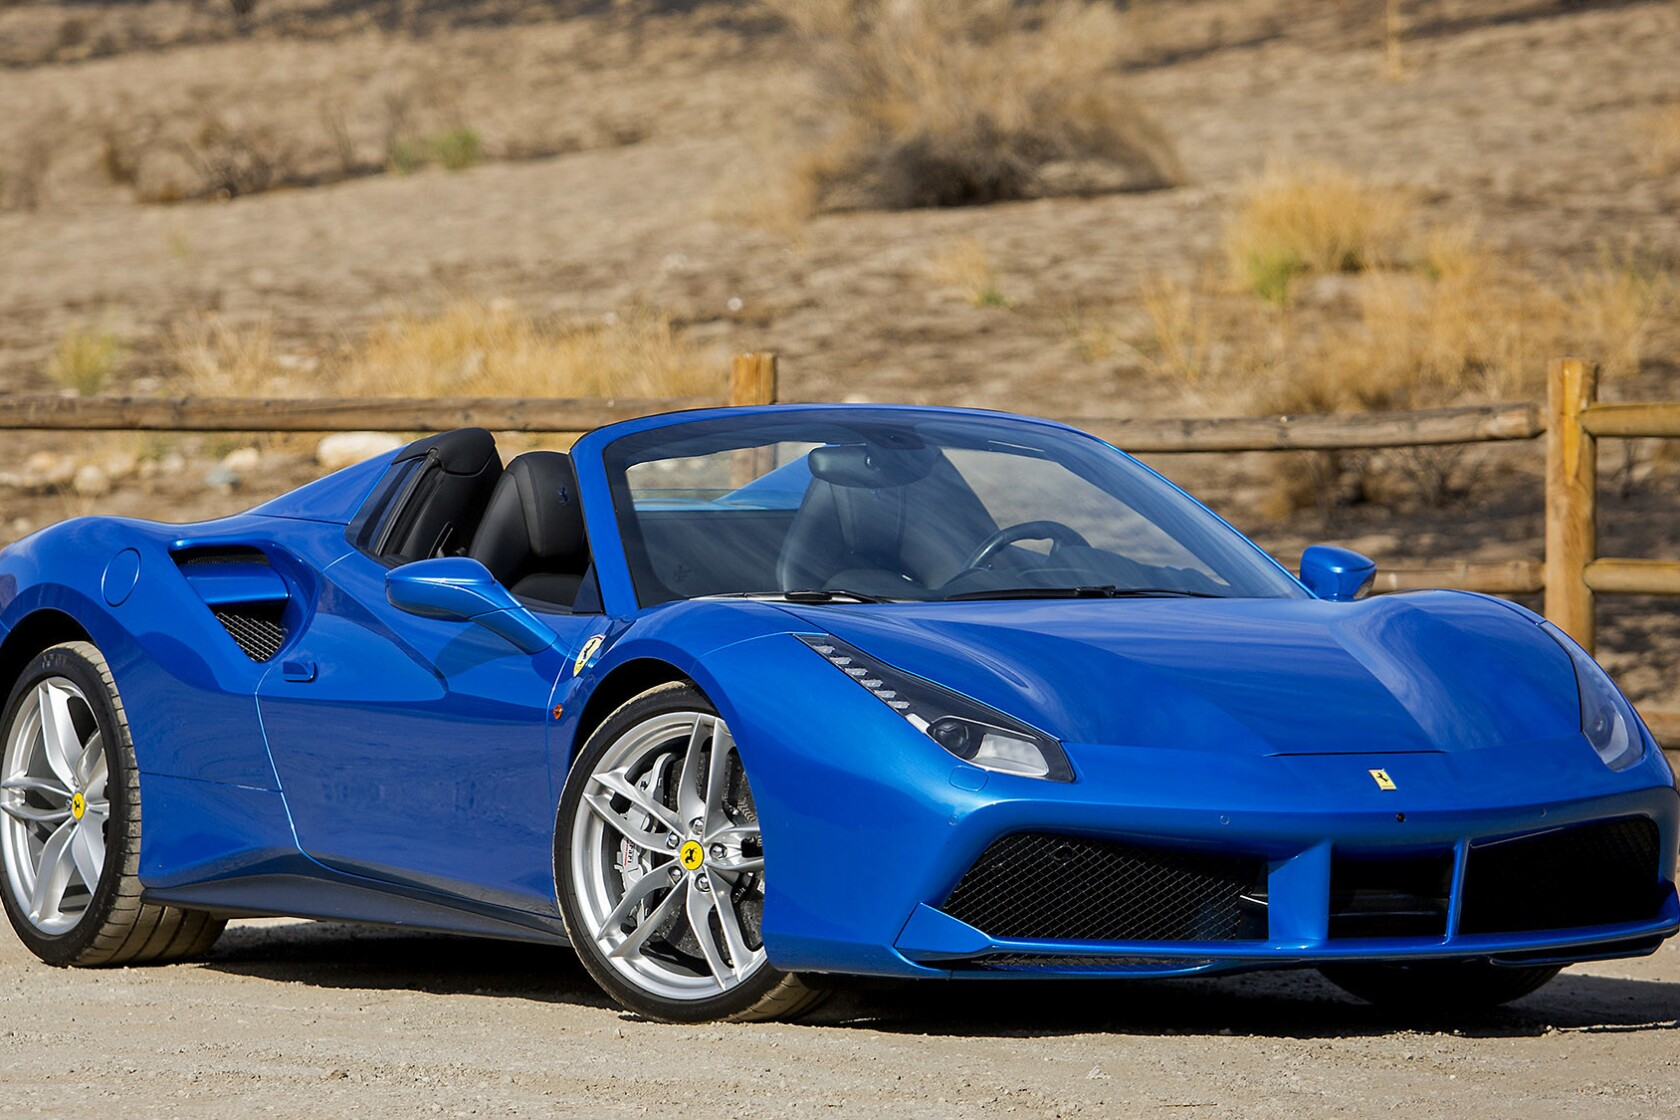 2017 Ferrari 488 Spider >> 2017 Ferrari 488 Spider Perfection 8212 Almost Los Angeles Times